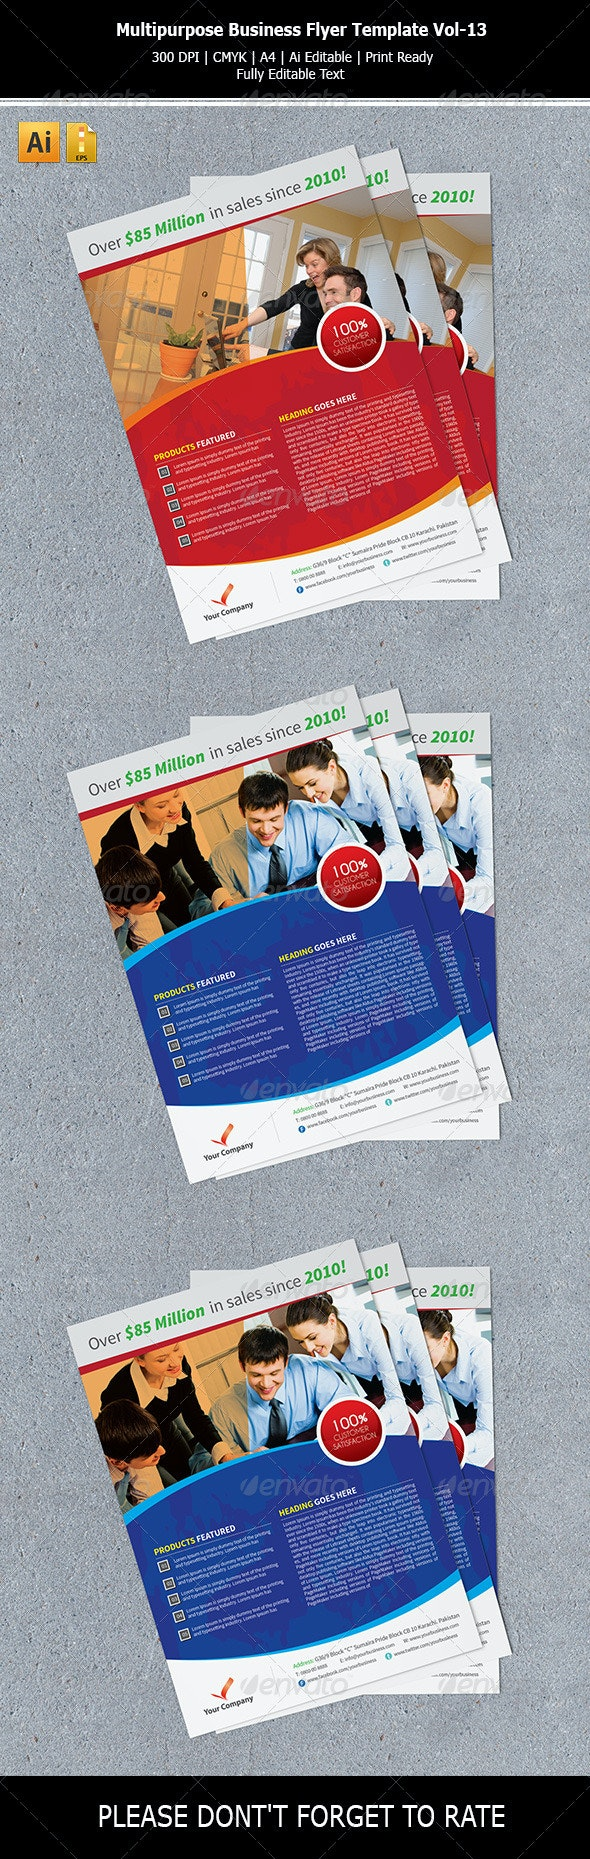 Multipurpose Business Flyer Template Vol-13 - Corporate Flyers